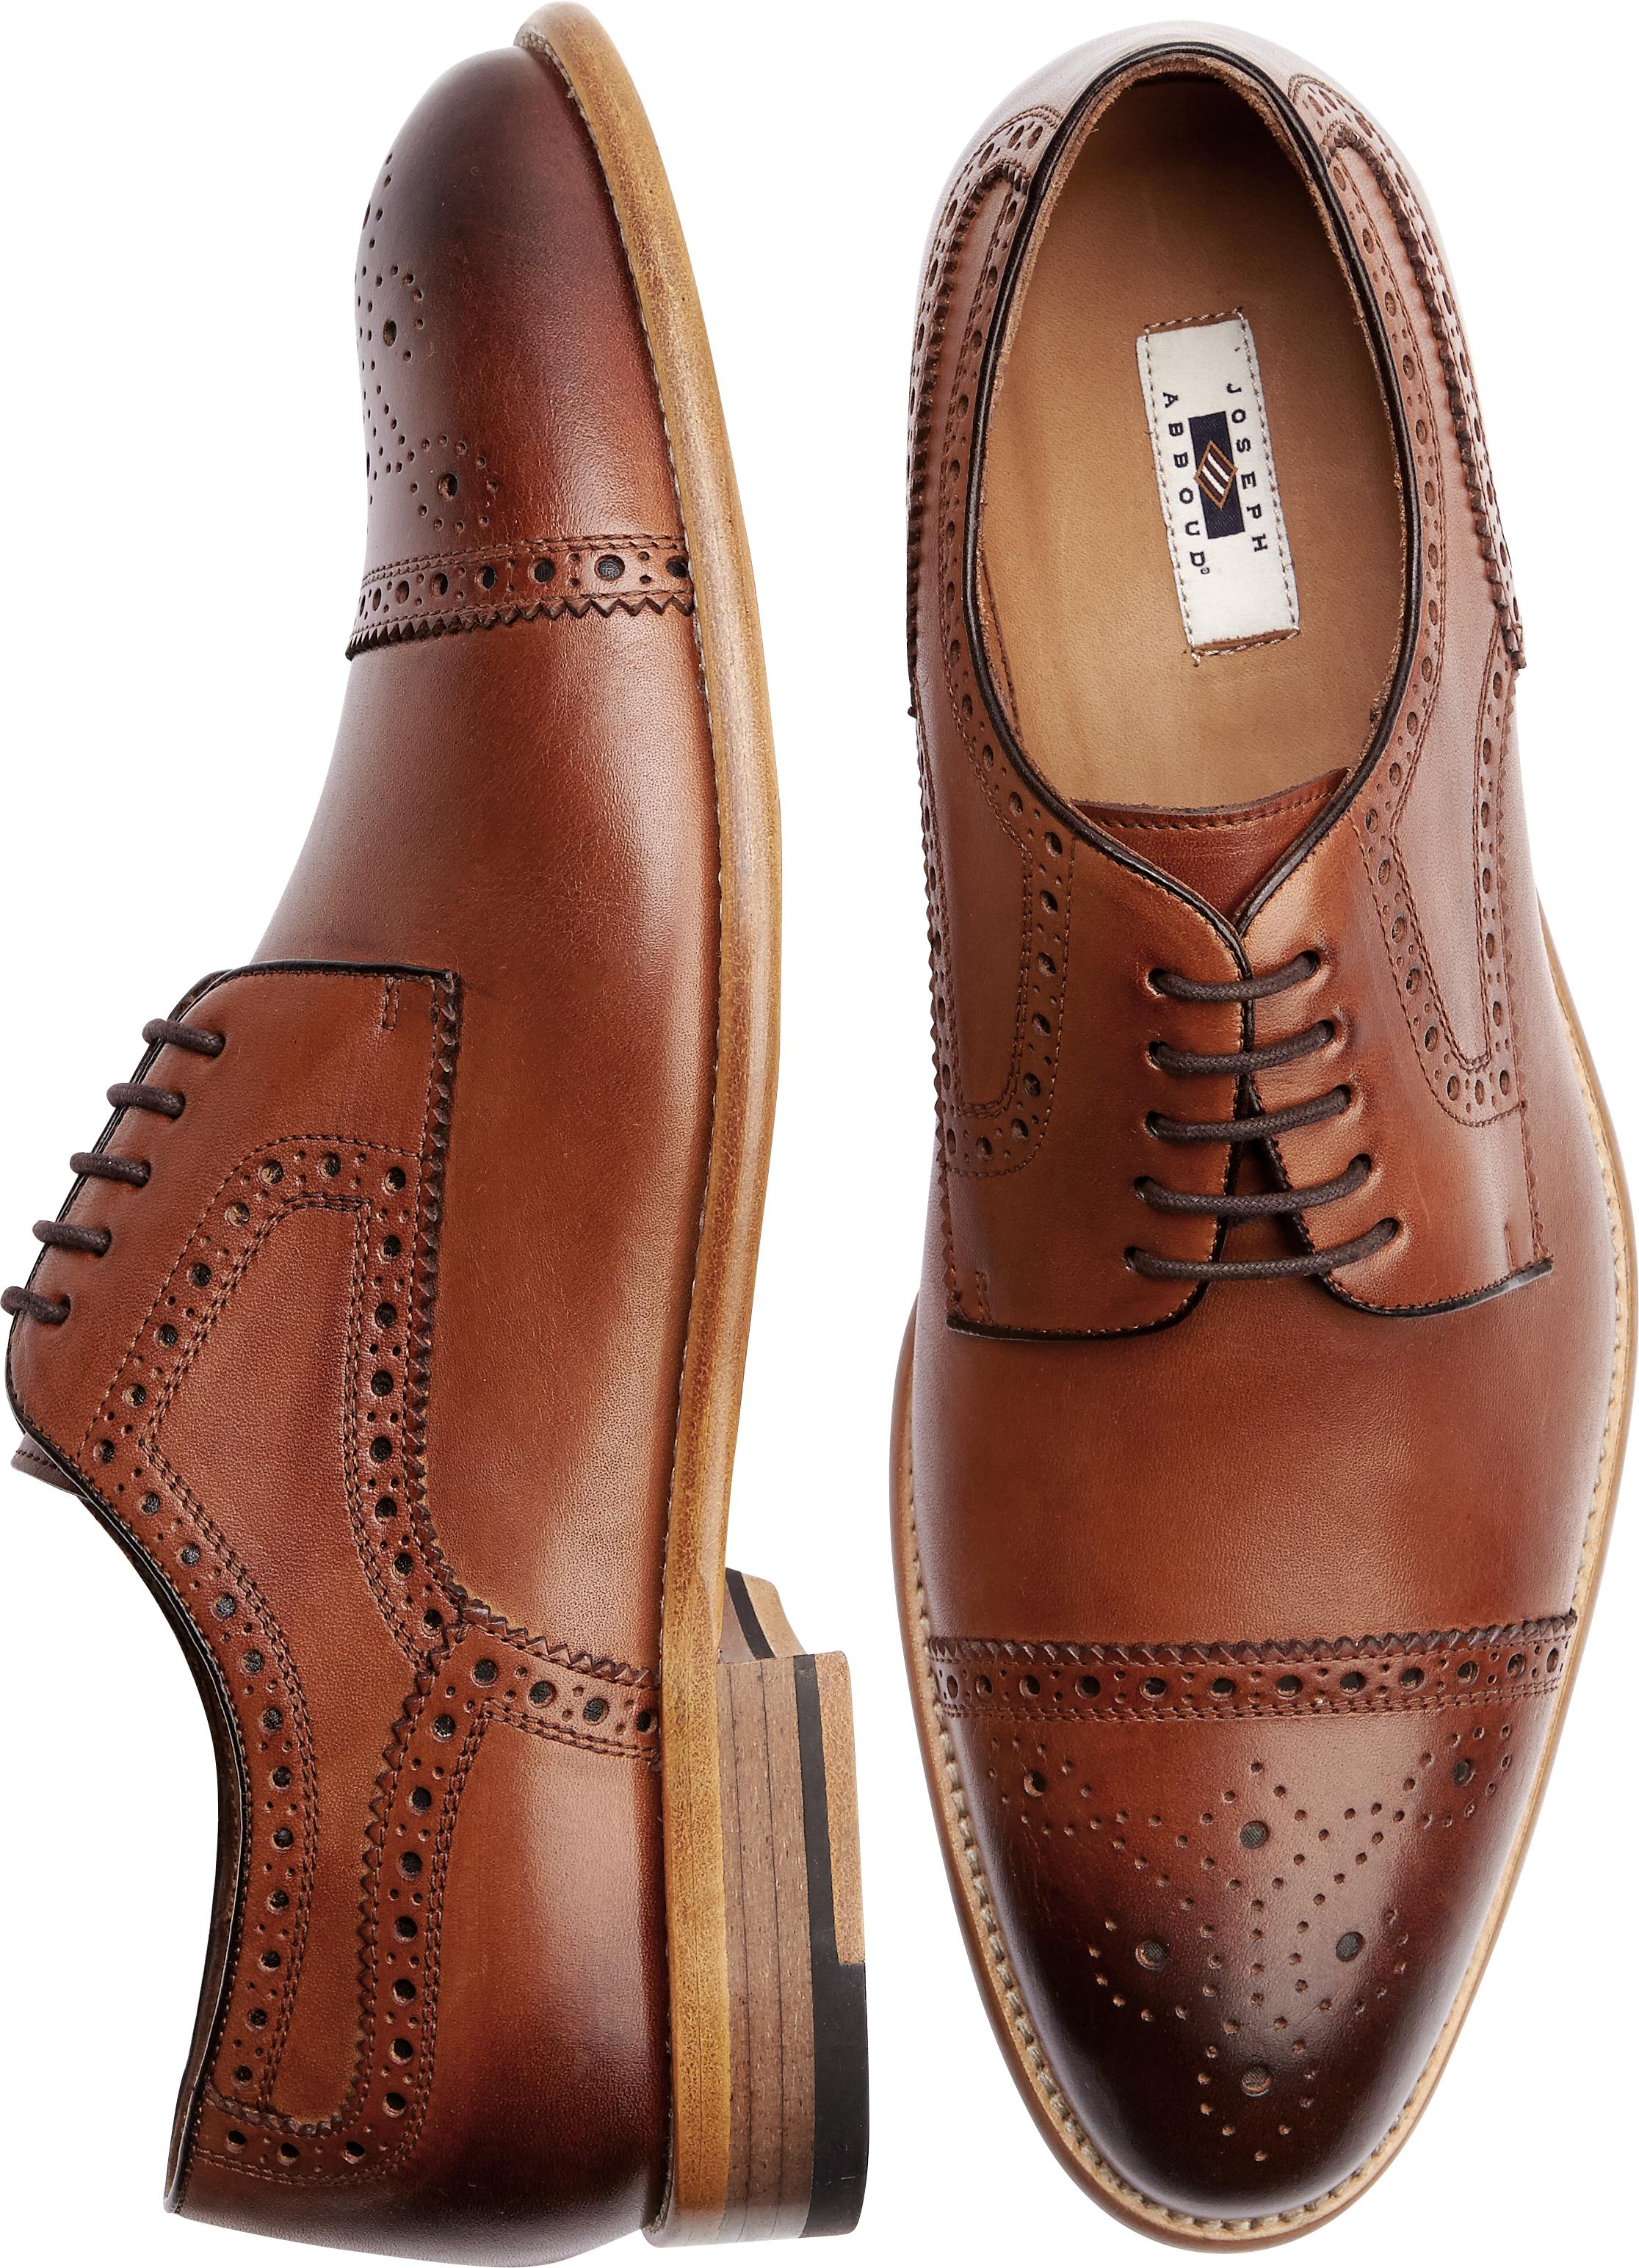 Camel Mens Business Leather LaceUp CapToe Derby Shoes Dress Shoes  6IKEJ7RH5